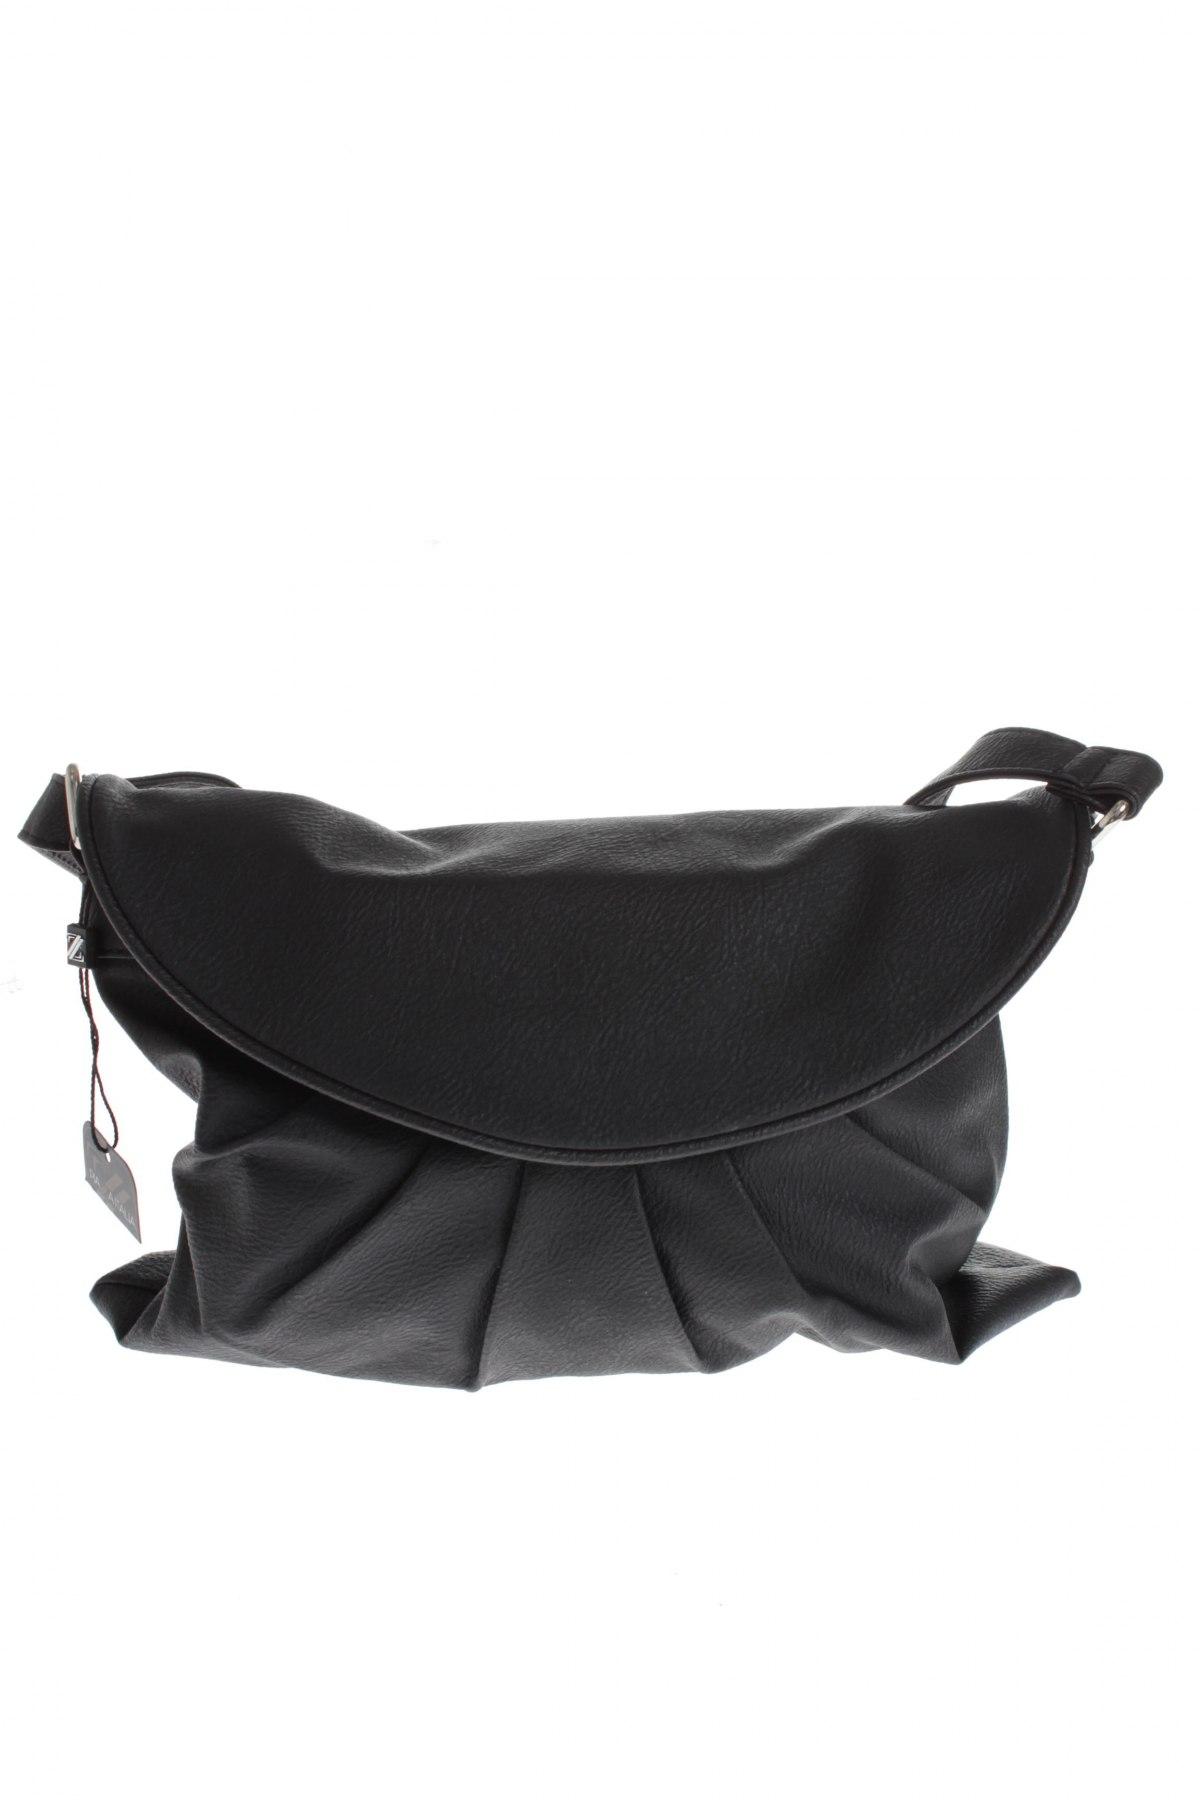 65f878b02b Γυναικεία τσάντα Piazza Italia - σε συμφέρουσα τιμή στο Remix -  7602508